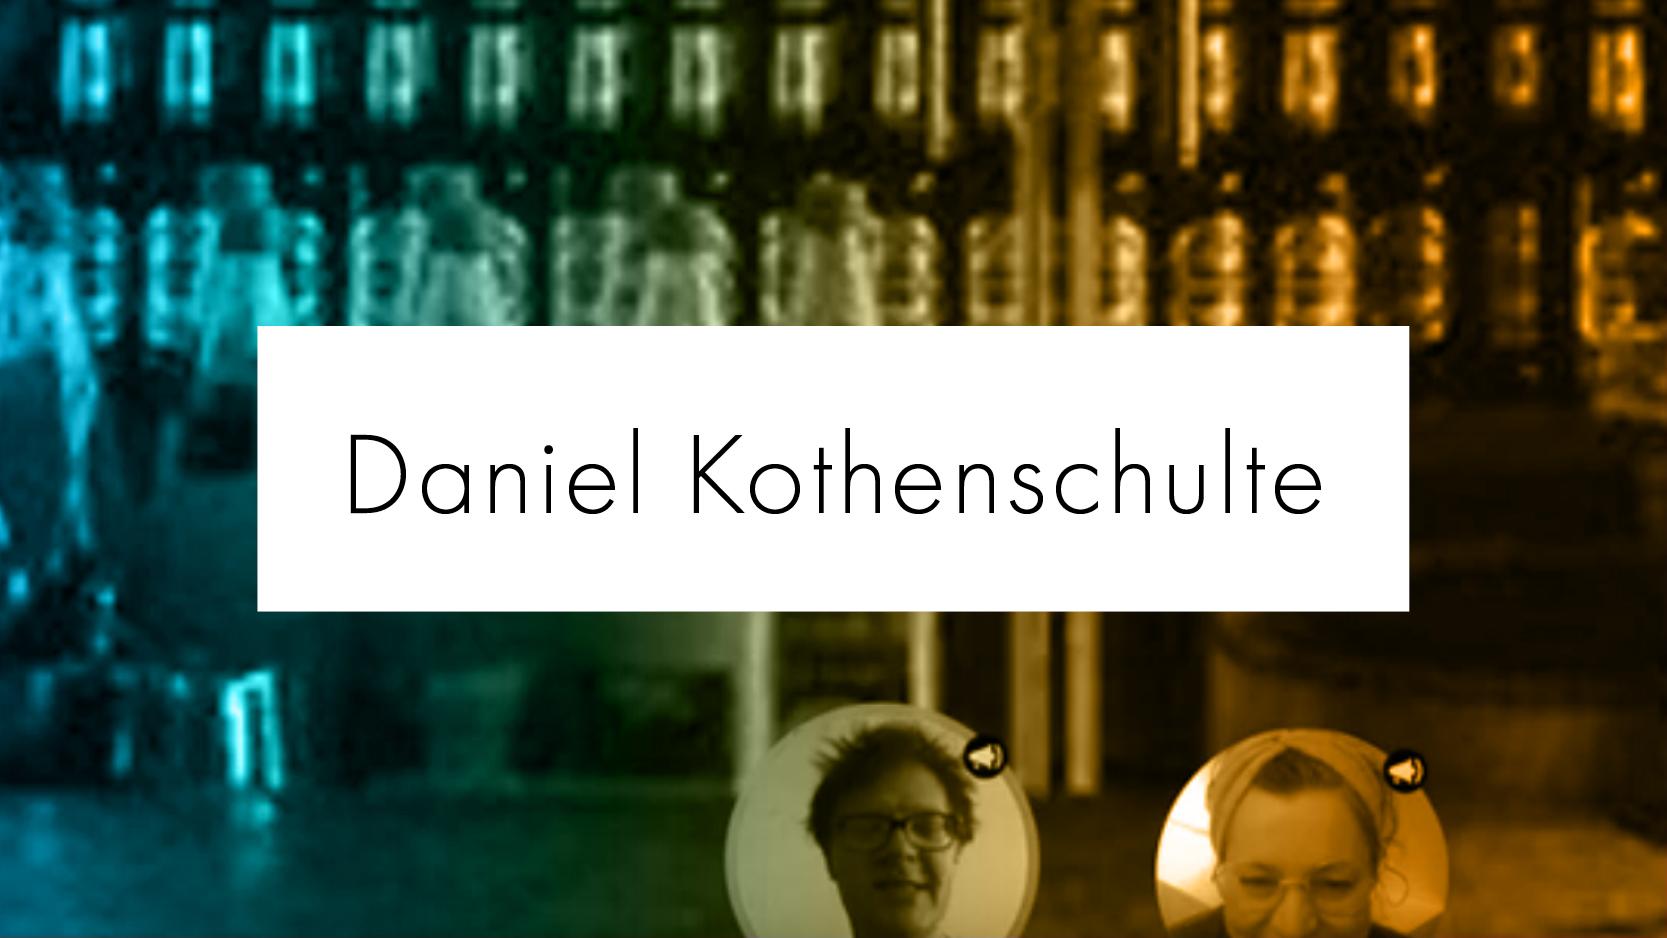 Daniel Kotheschulte